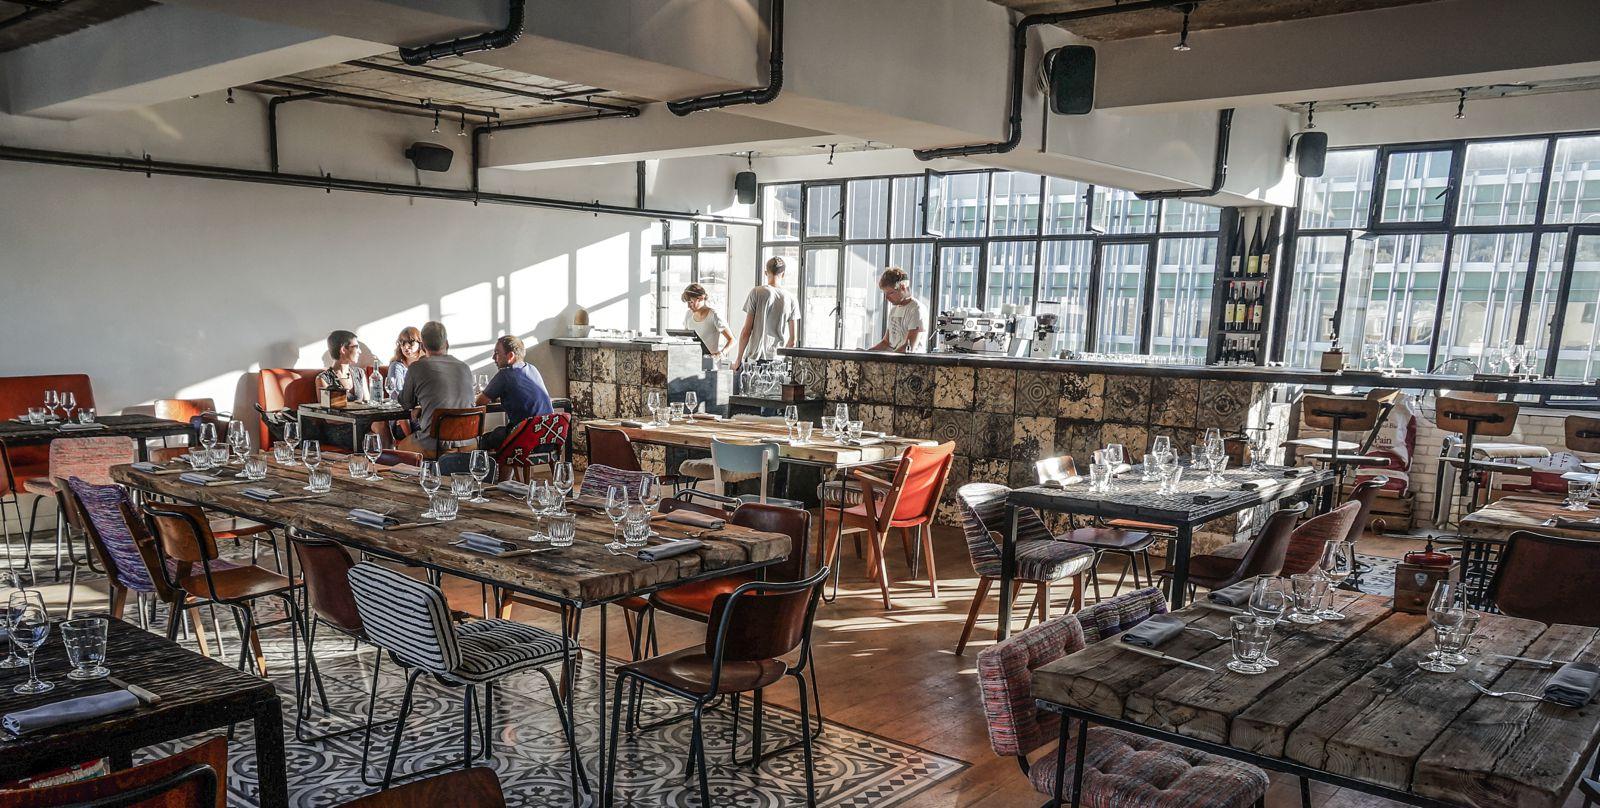 10 Amazing Restaurants With The Best Views In Paris (4)